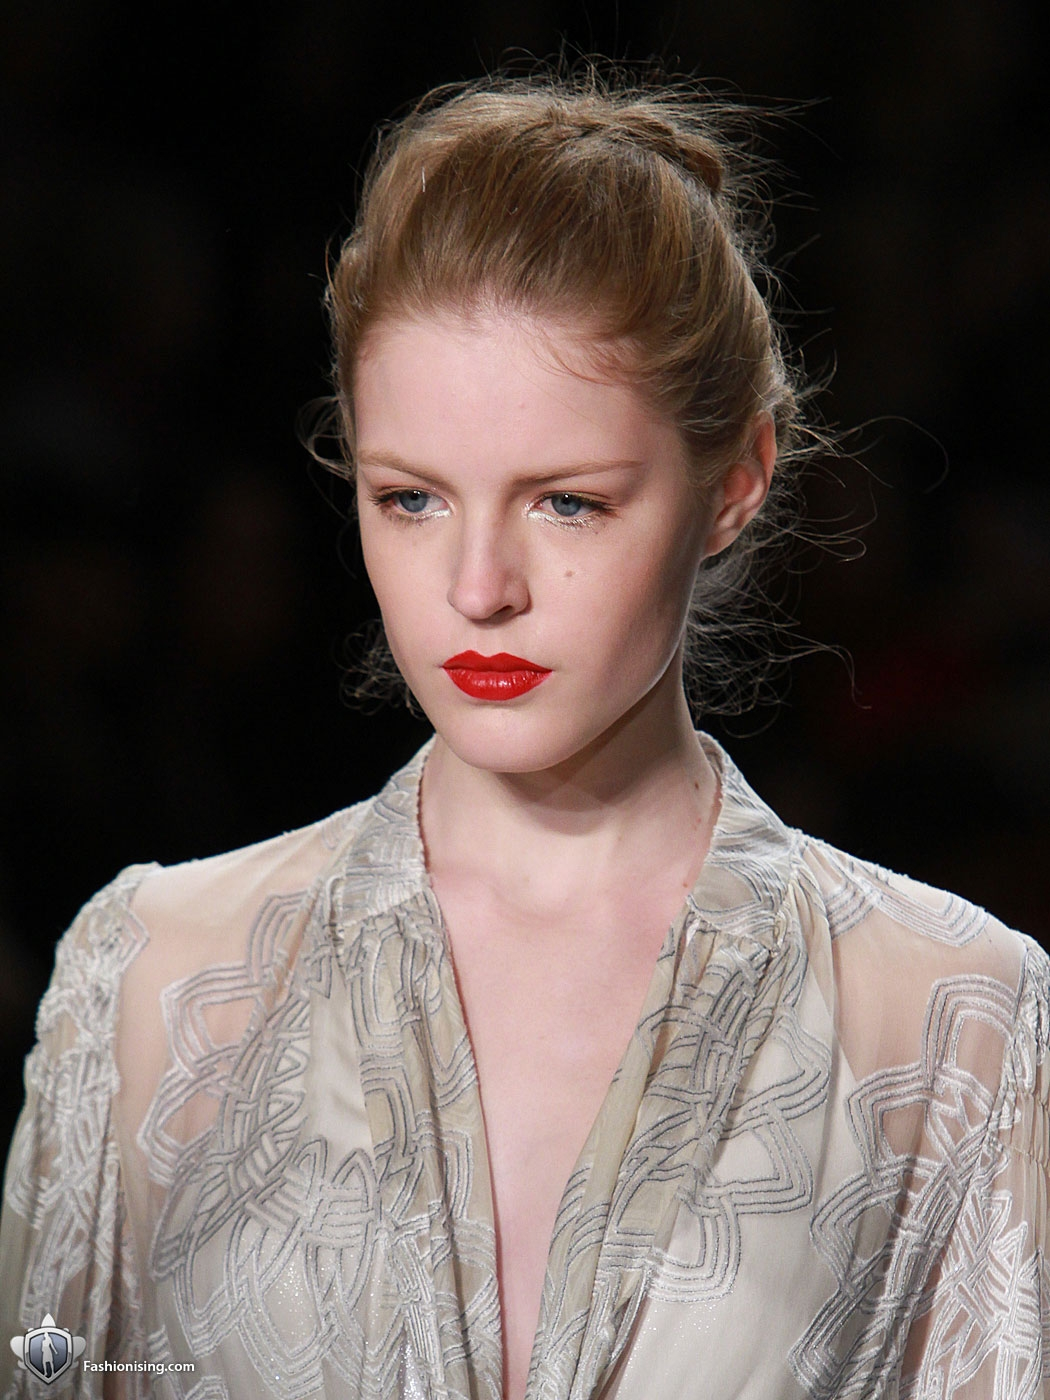 http://4.bp.blogspot.com/--QuGfluzVy8/TlN7m8oaK7I/AAAAAAAAHN8/9OiqDlME0dY/s1600/New-York-Fashion-Nanette-Lepore-Boudoir-08.jpg